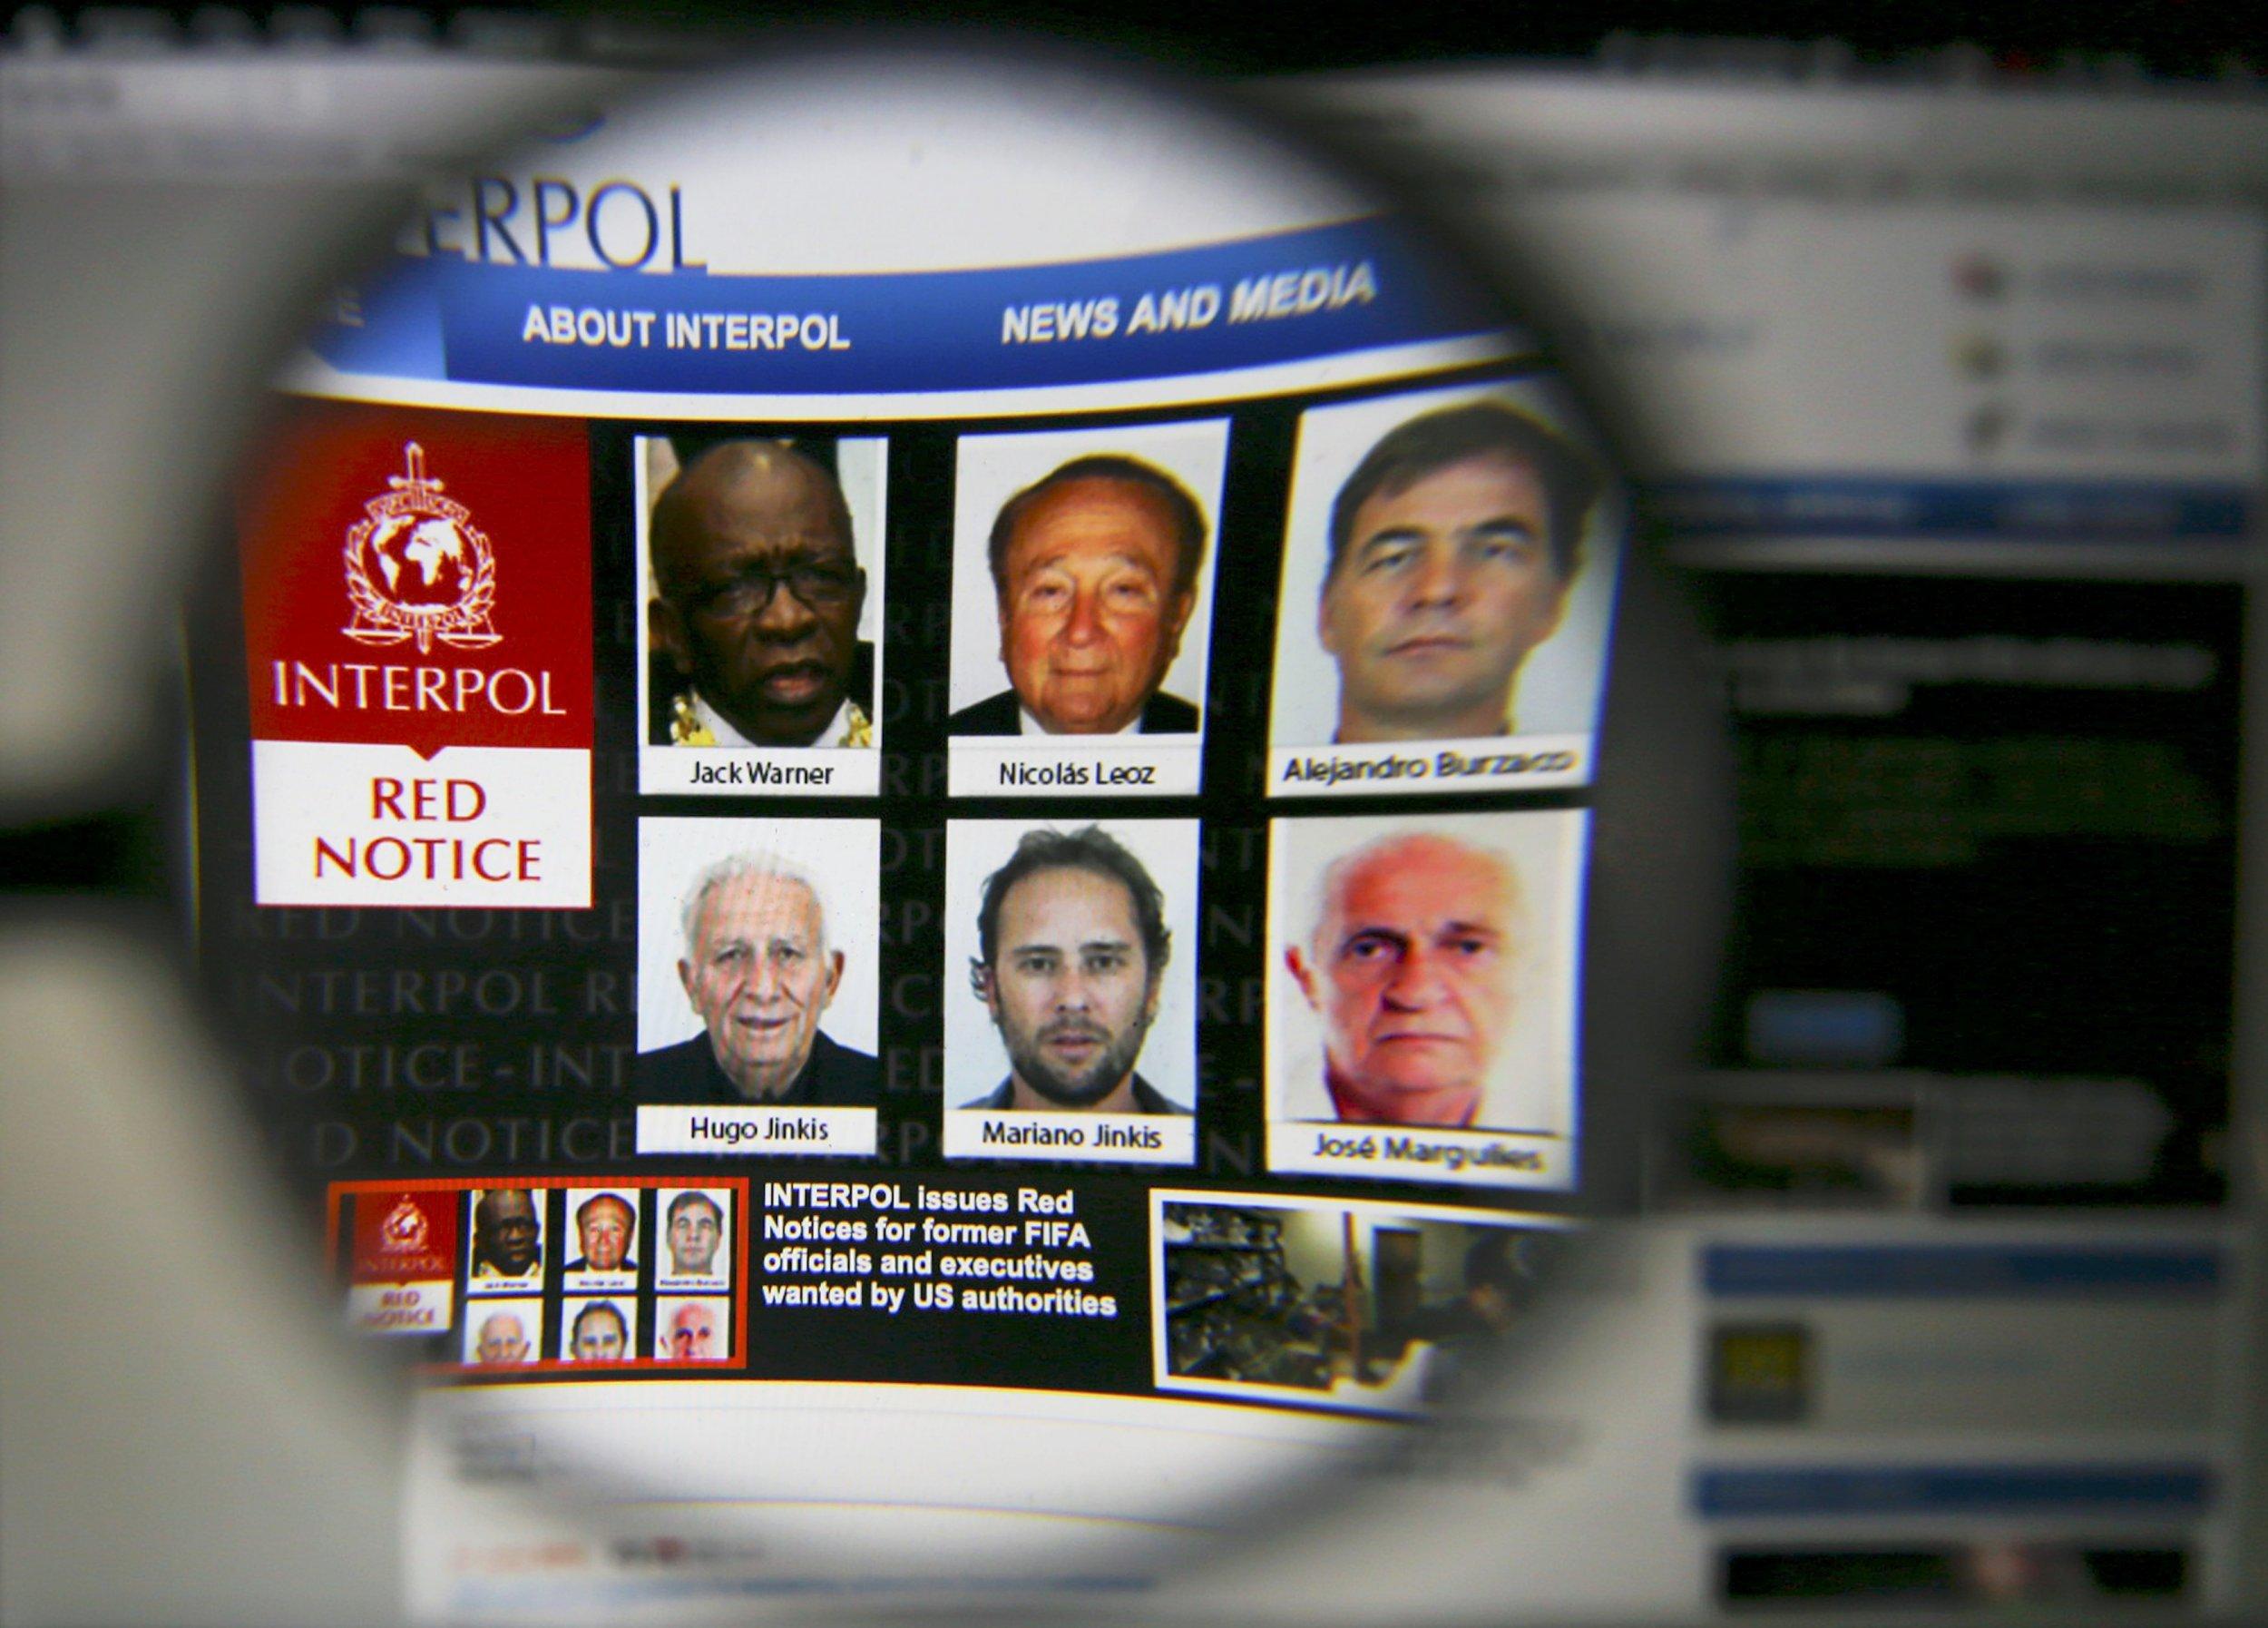 Interpol red notice